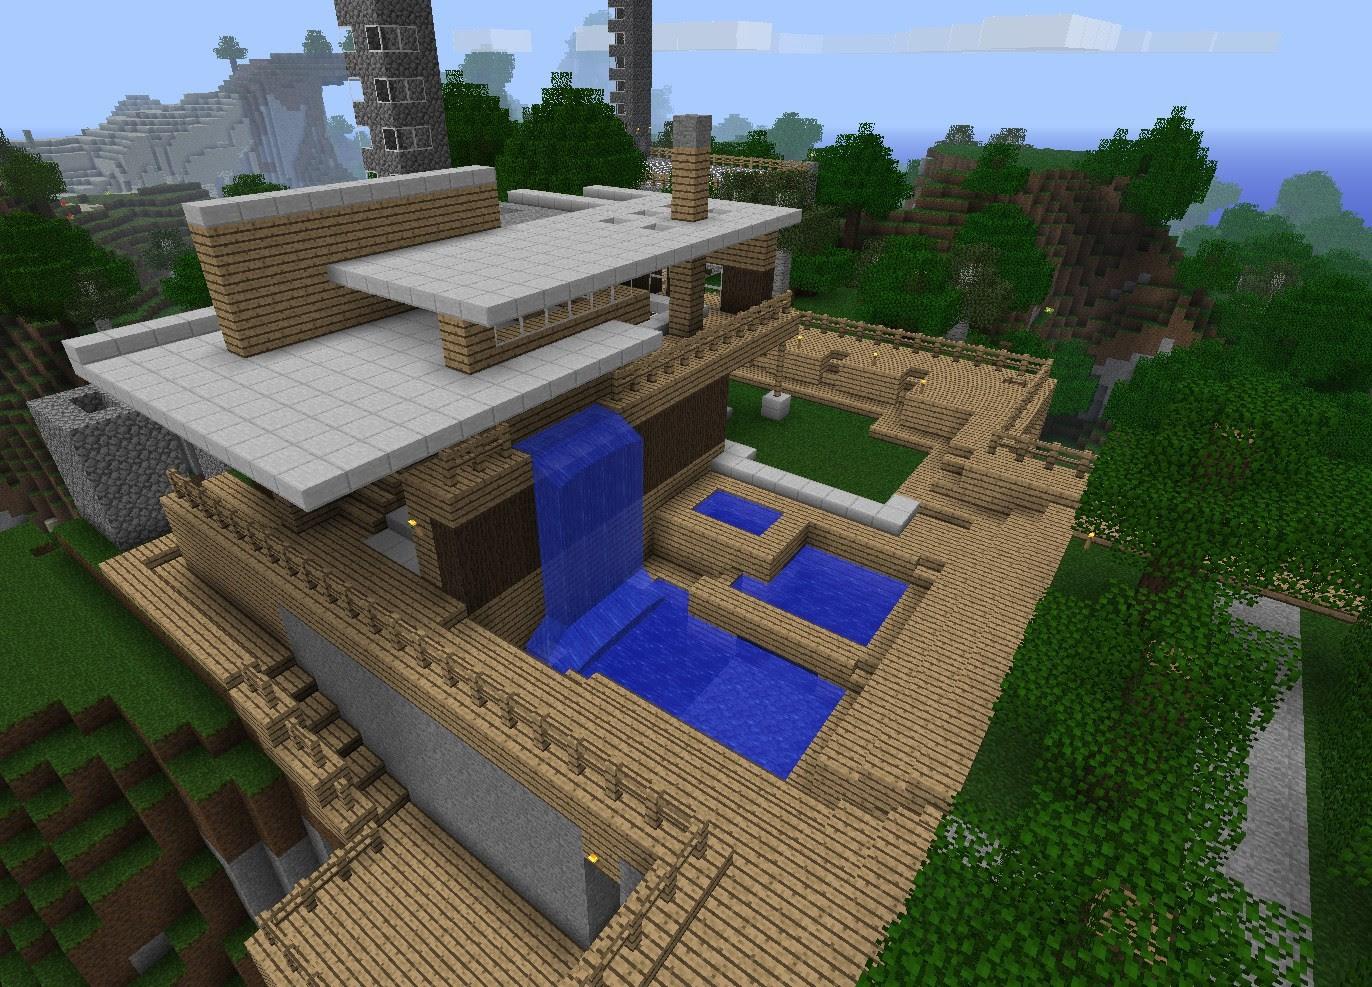 Minecraft House Designs Survival Rumah Joglo Limasan Work